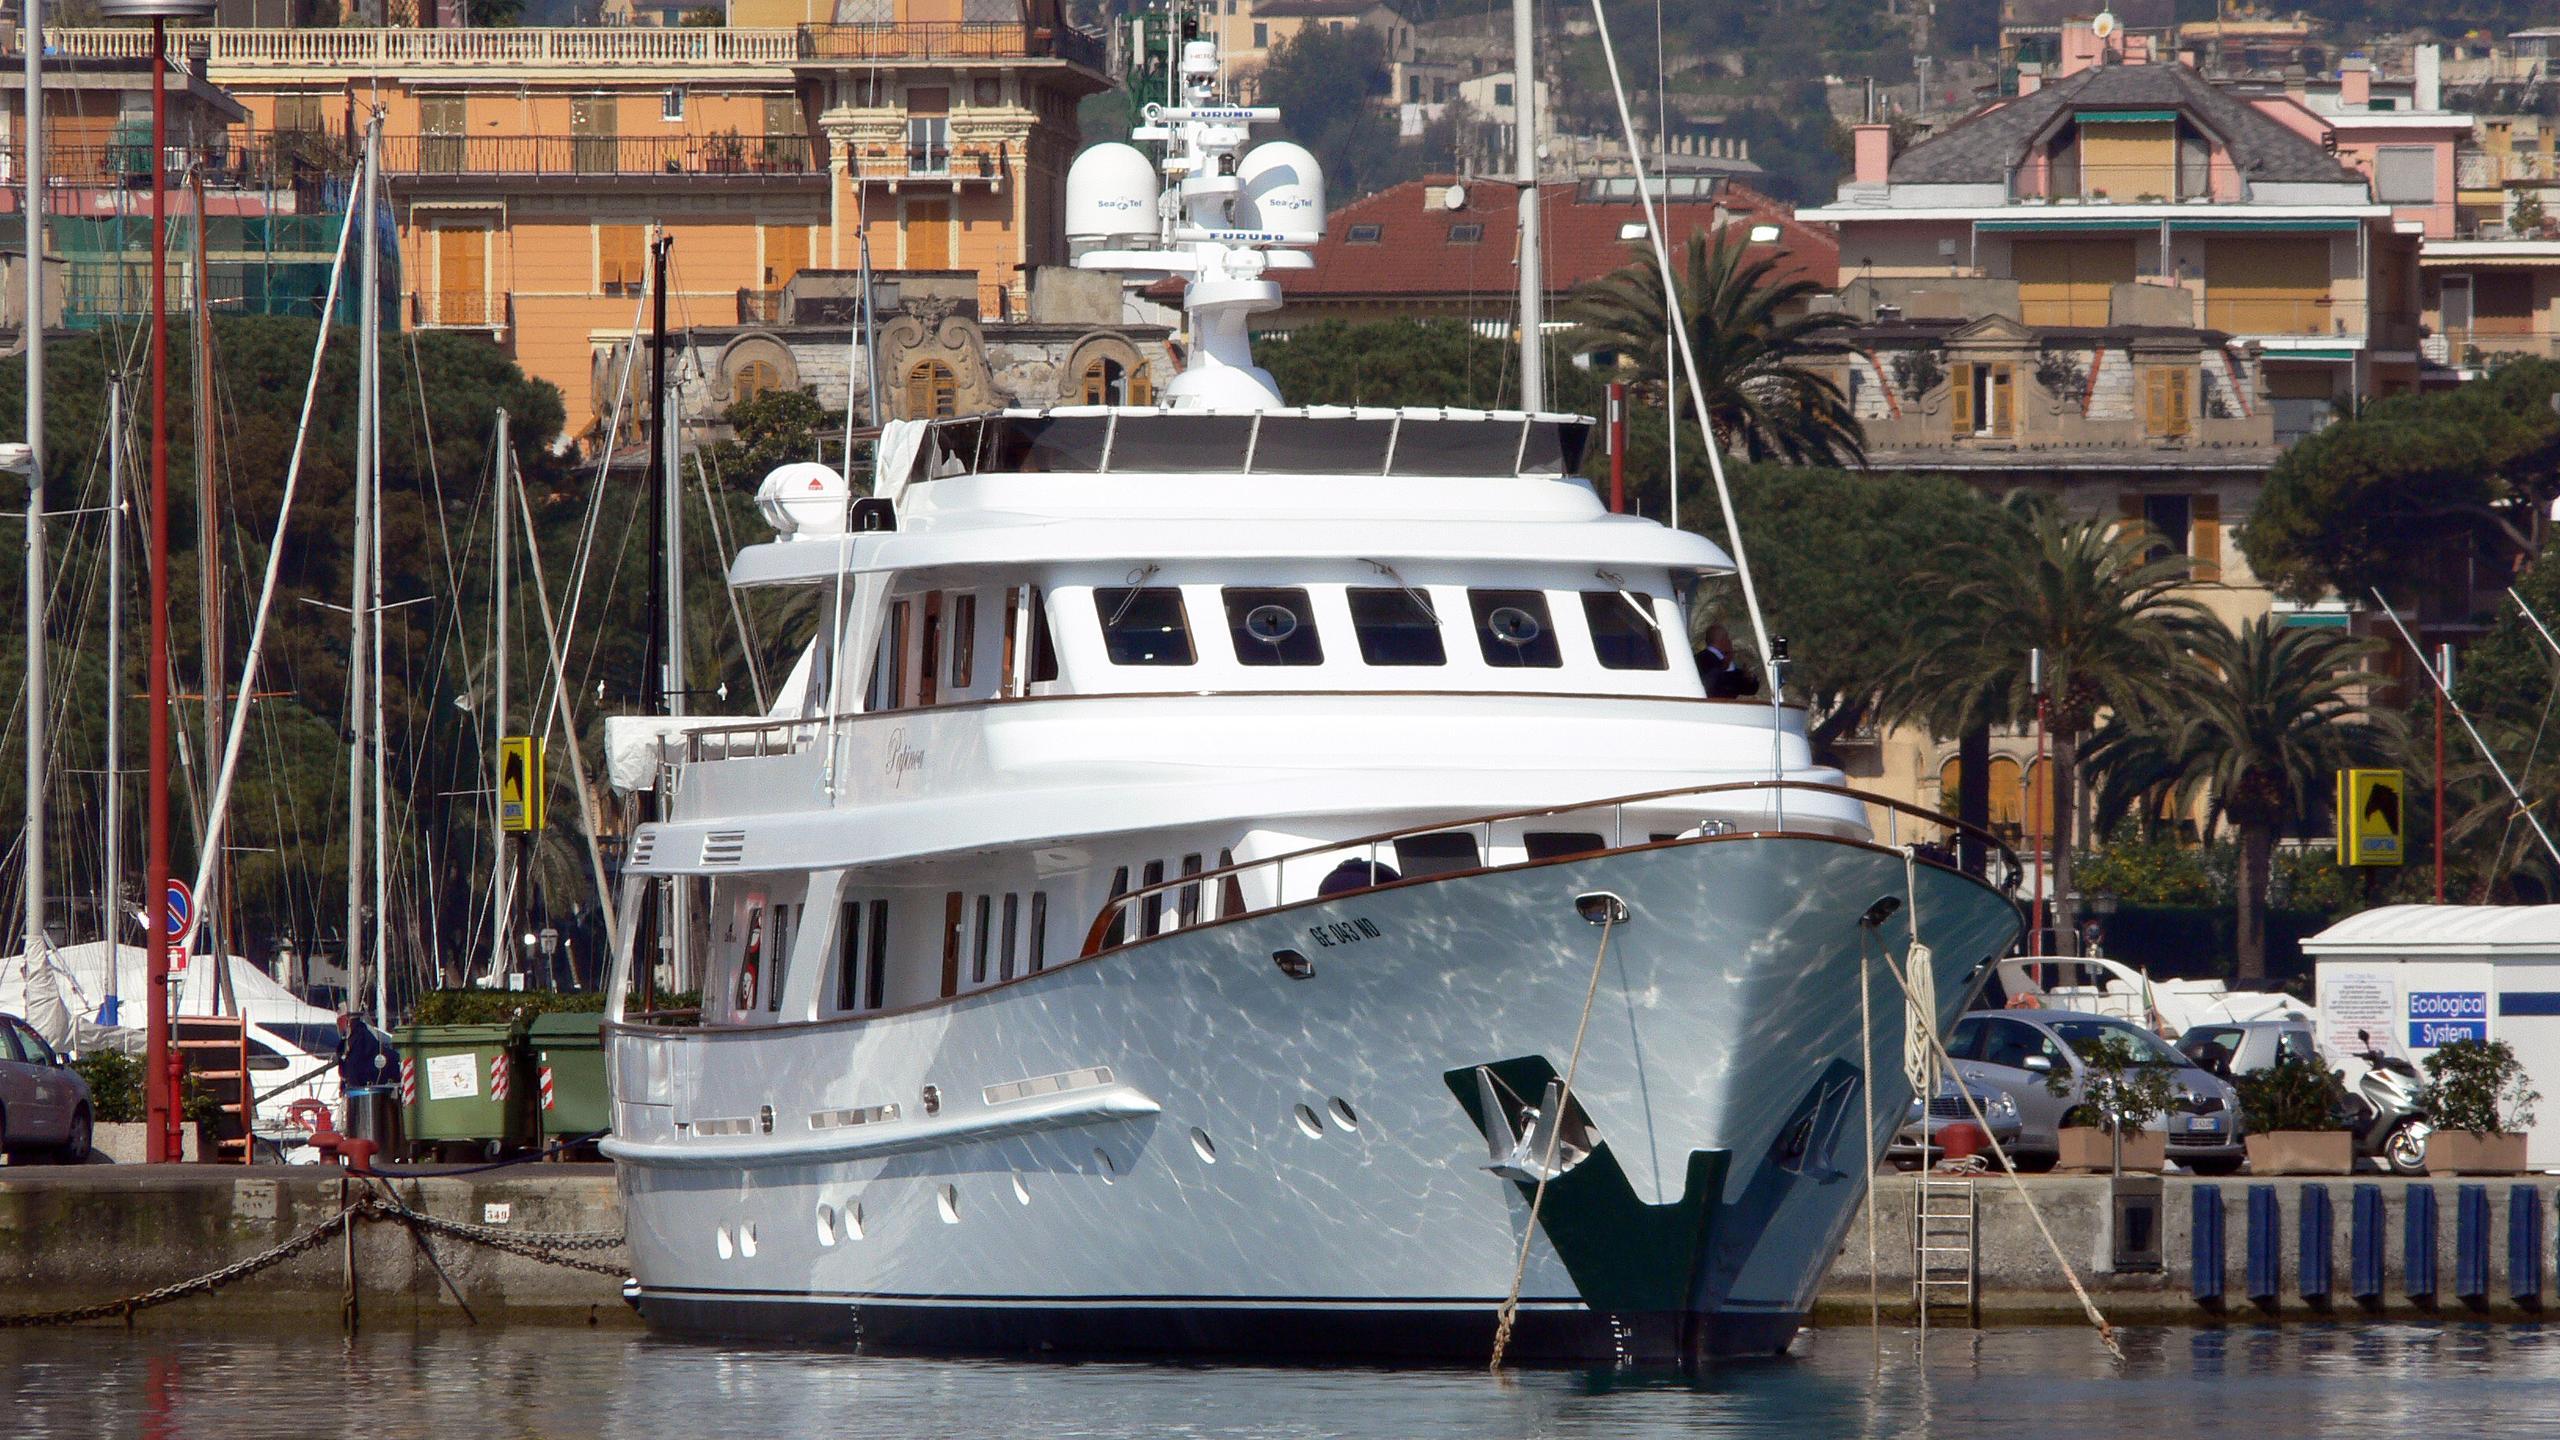 papinou-motor-yacht-cbi-navi-2004-34m-bow